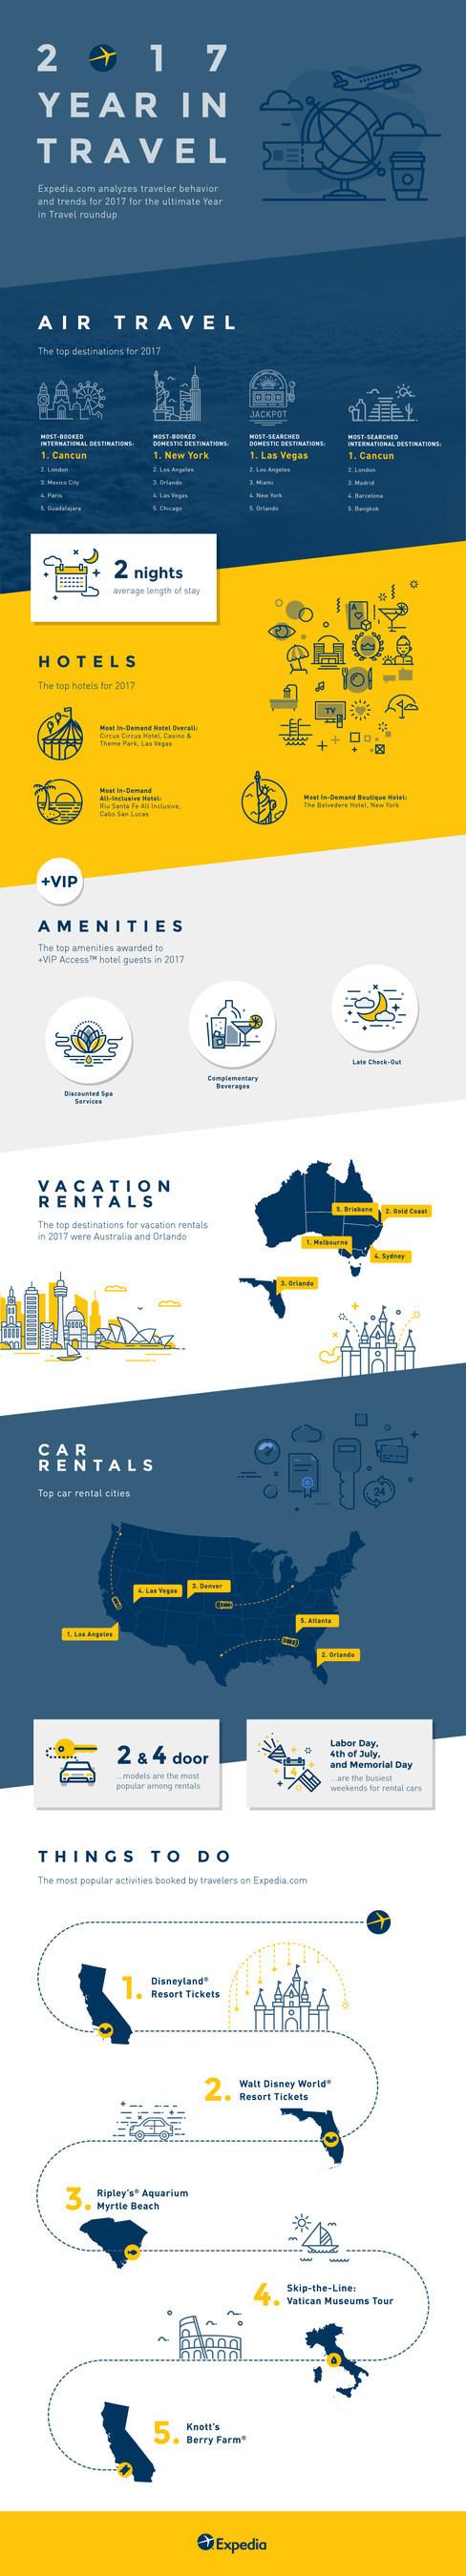 weekend getaways australian vacation rentals and disney. Black Bedroom Furniture Sets. Home Design Ideas